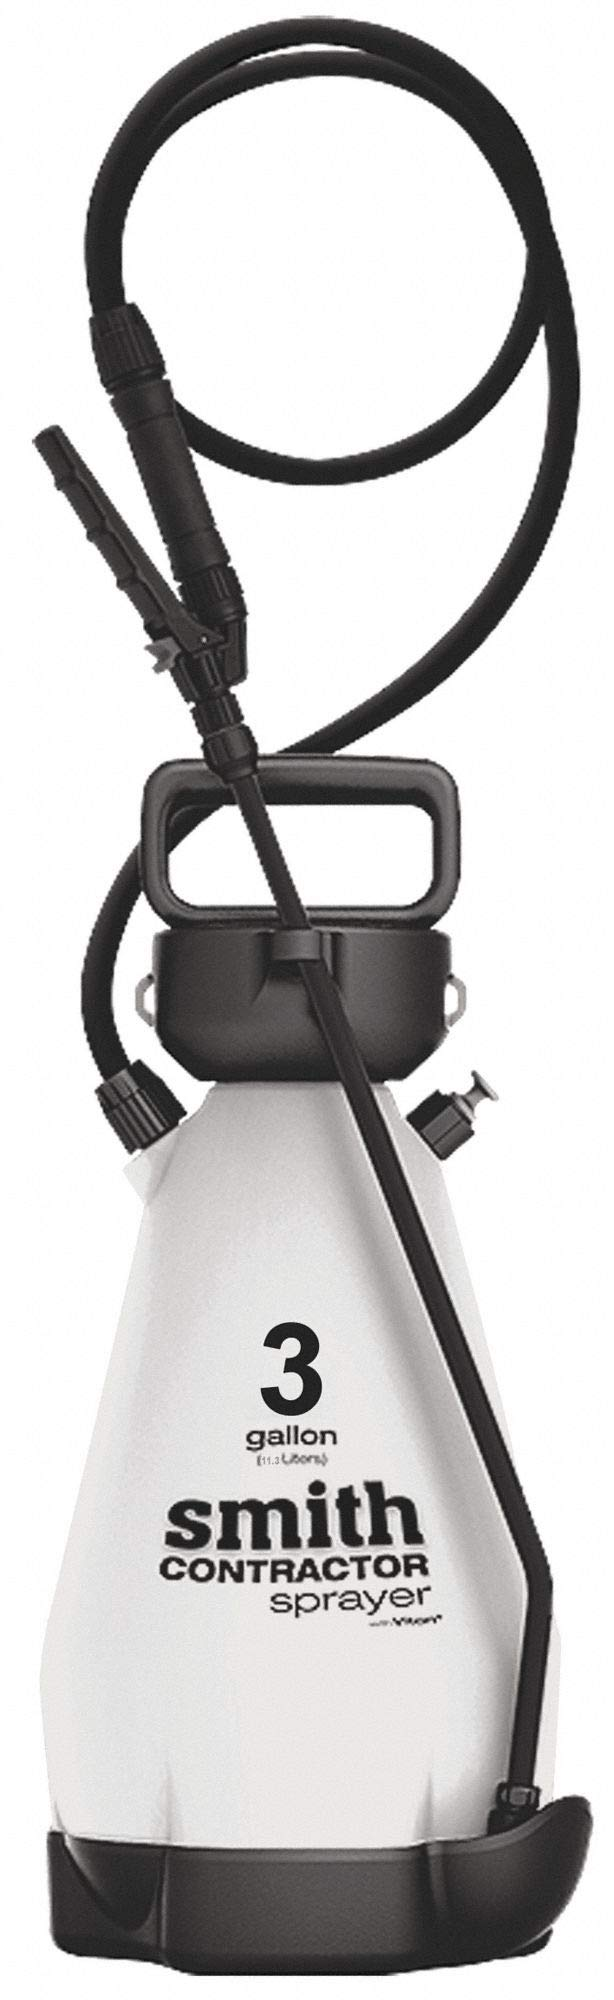 Shoulder Strap Sprayer, Polyethylene Tank Material, 3 gal, 40 psi Max Sprayer Pressure by DB SMITH